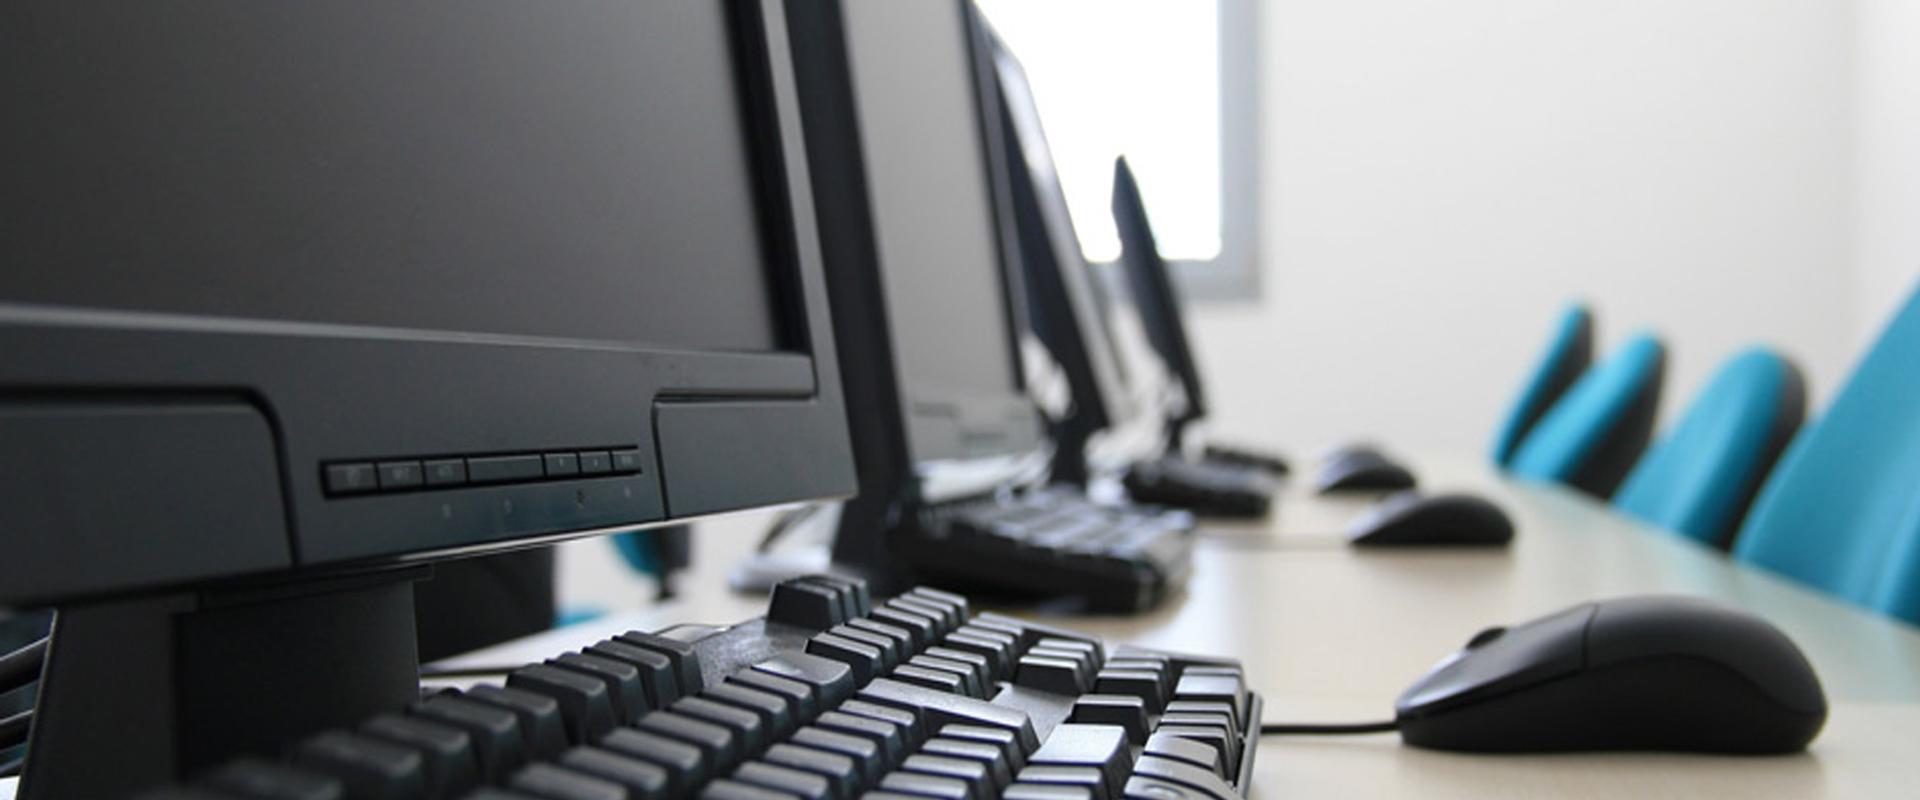 XCDIT Computer & IT Services Brisbane